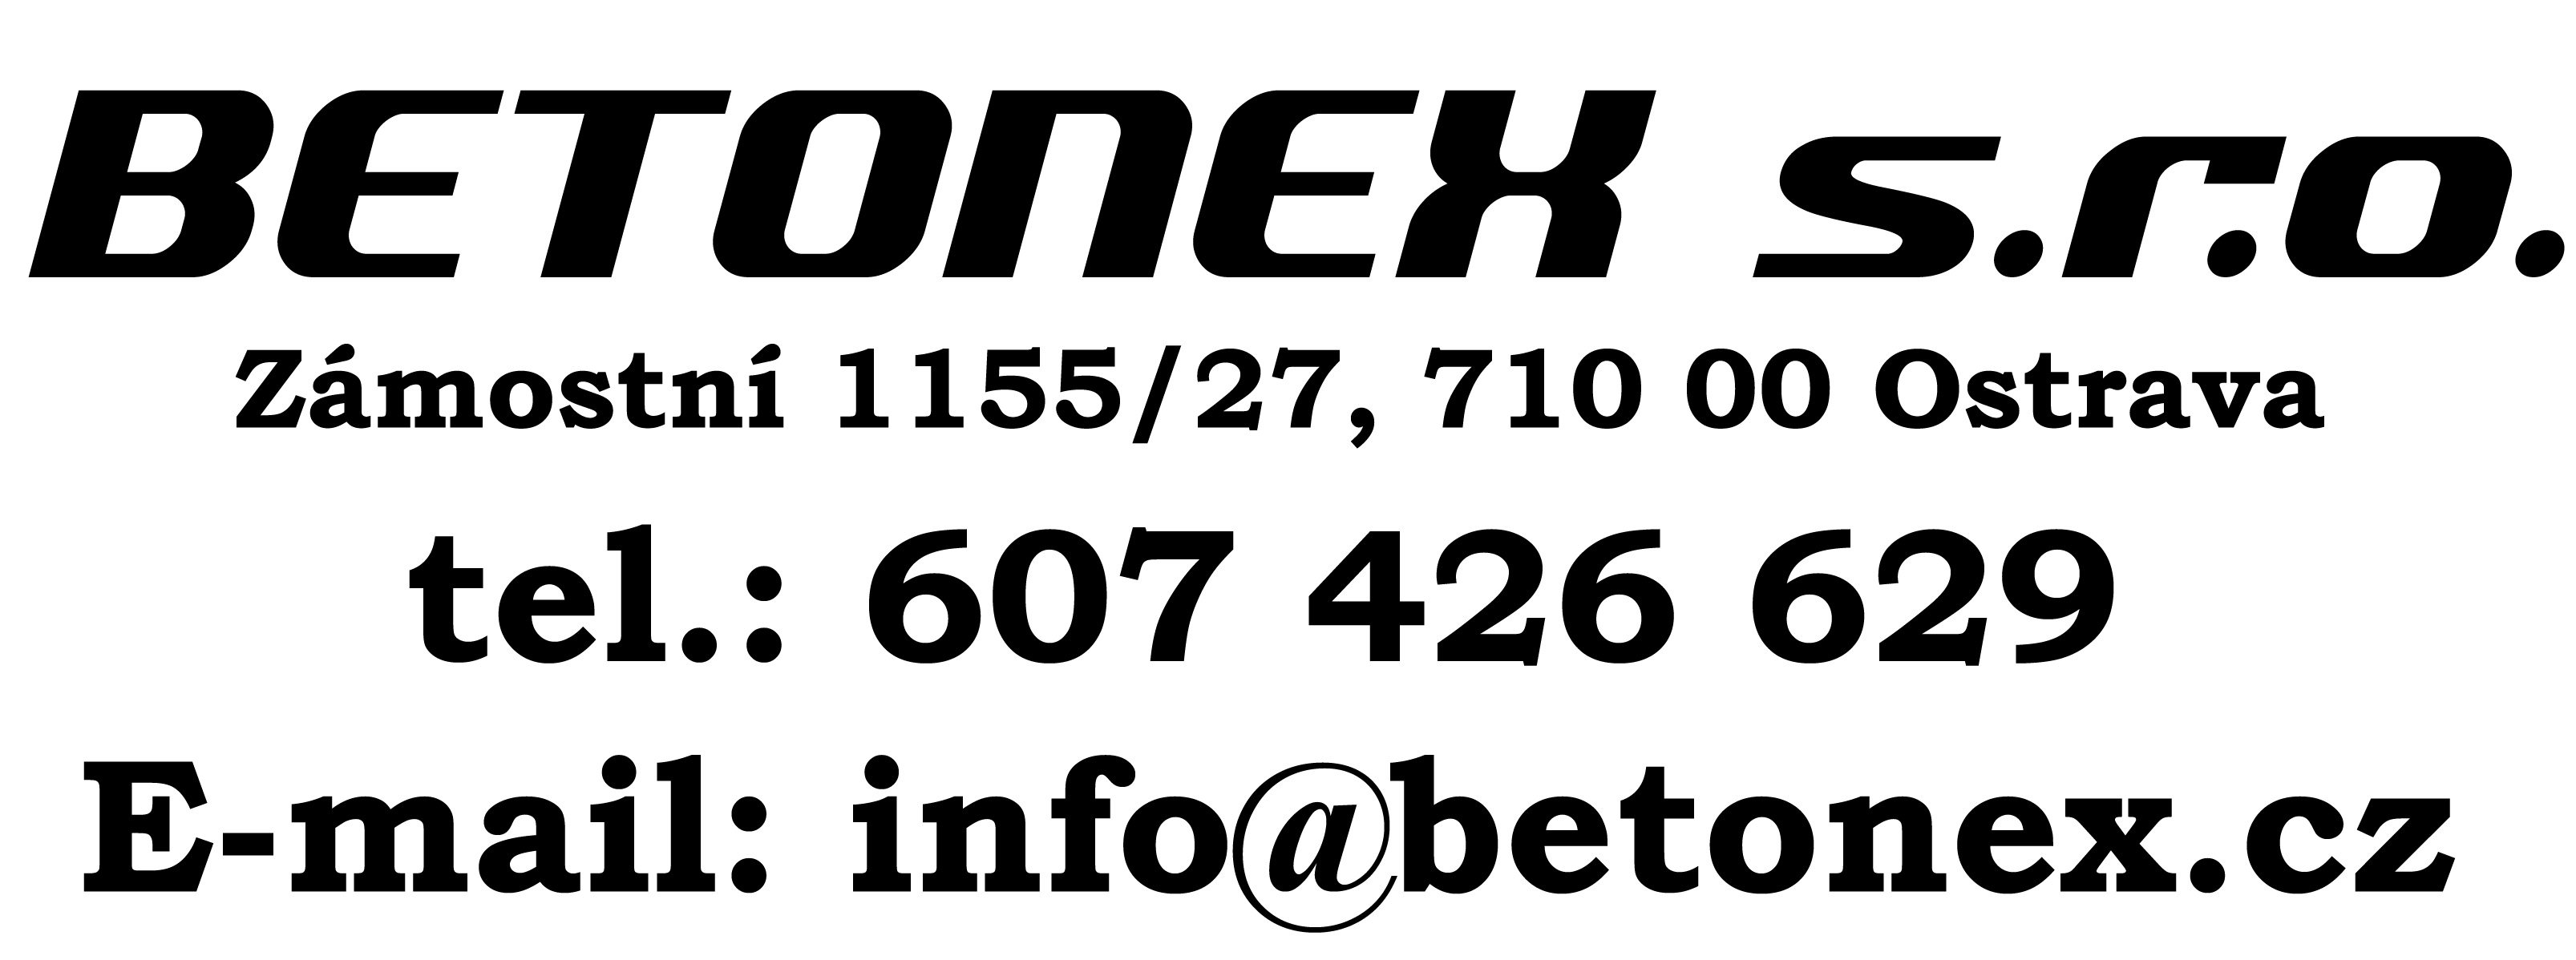 BETONEX - Kontakt